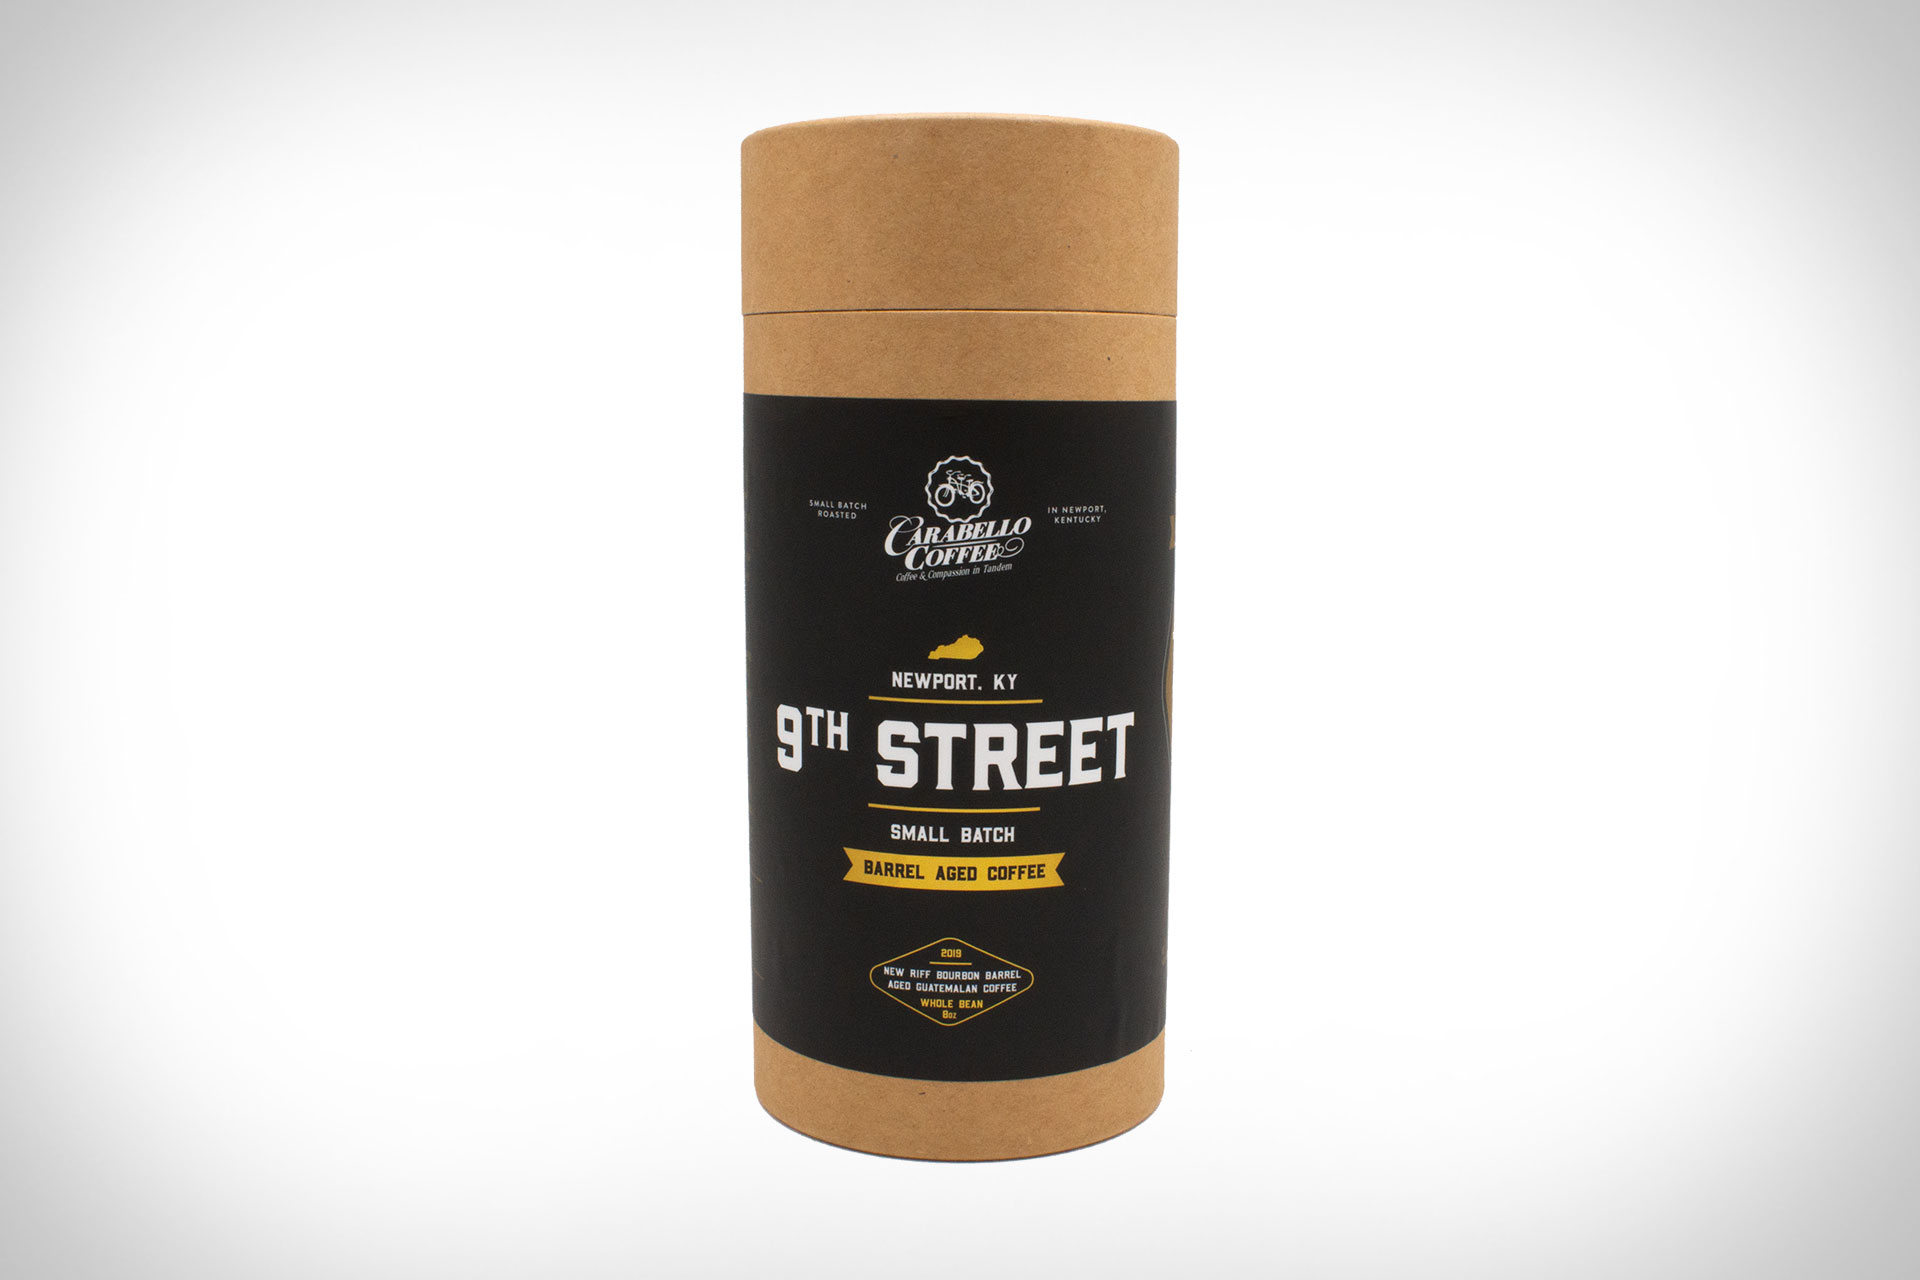 Carabello 9th Street Bourbon Barrel Aged Coffee